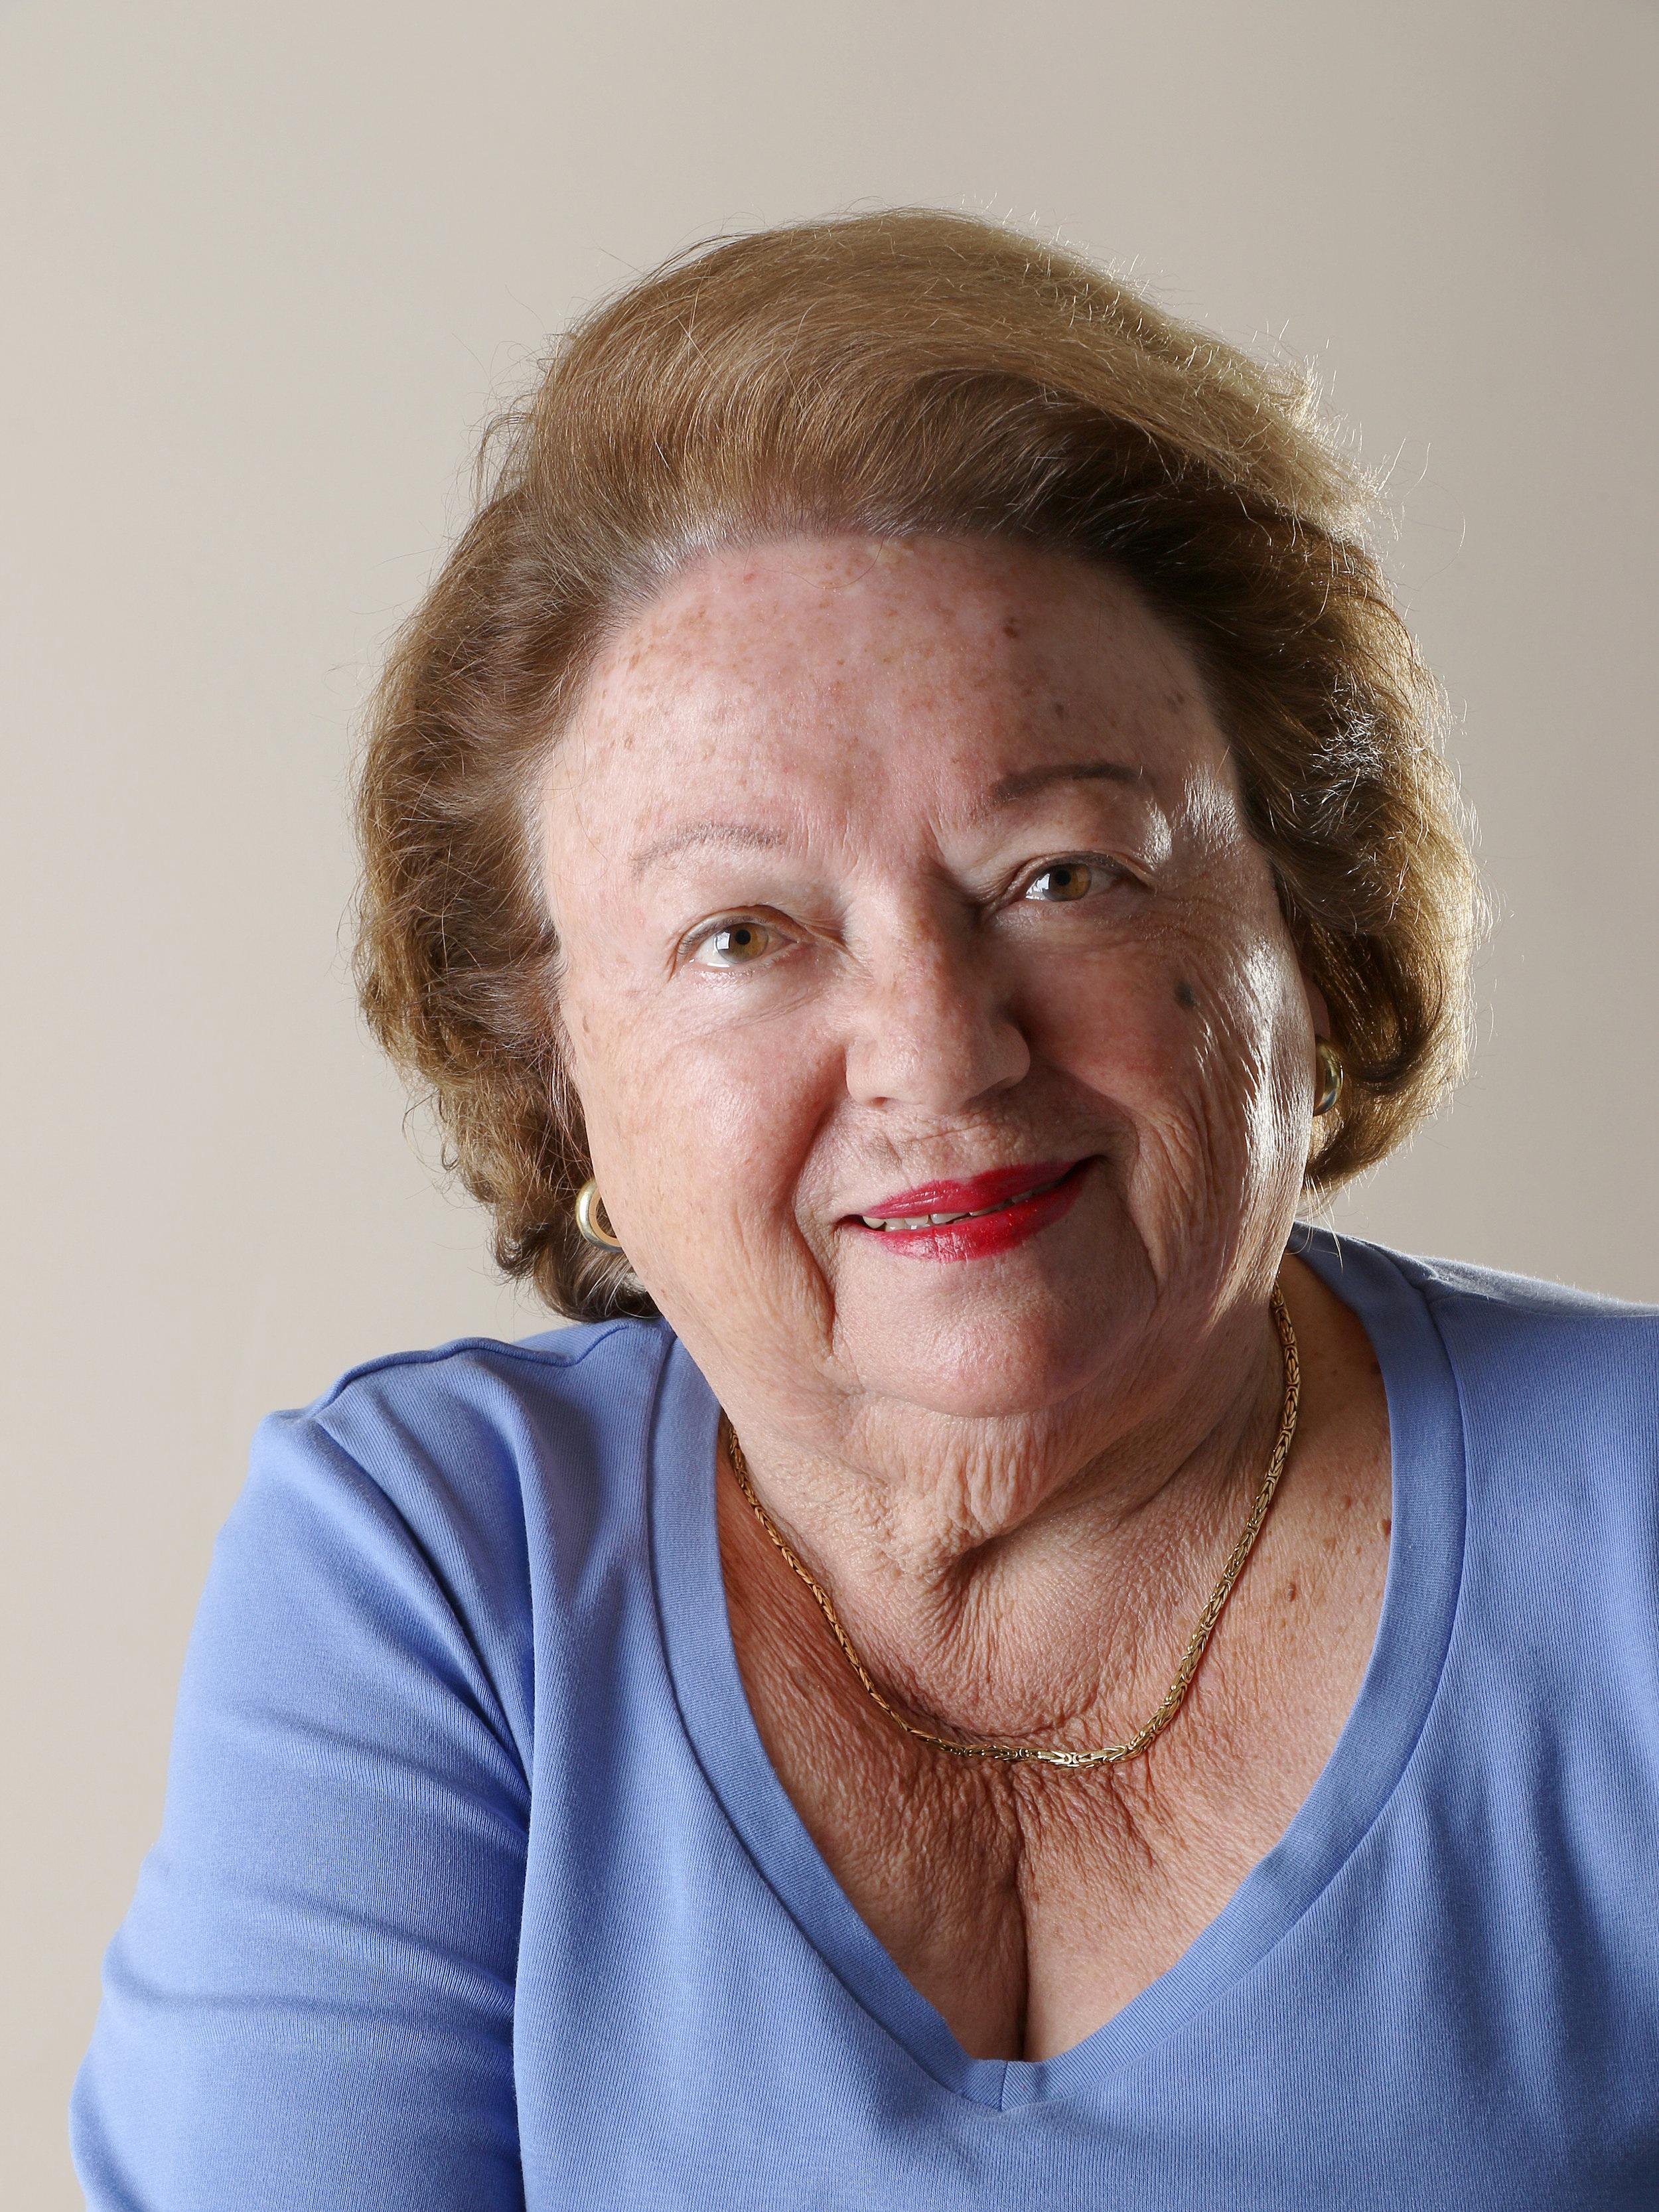 Anita Ekstein